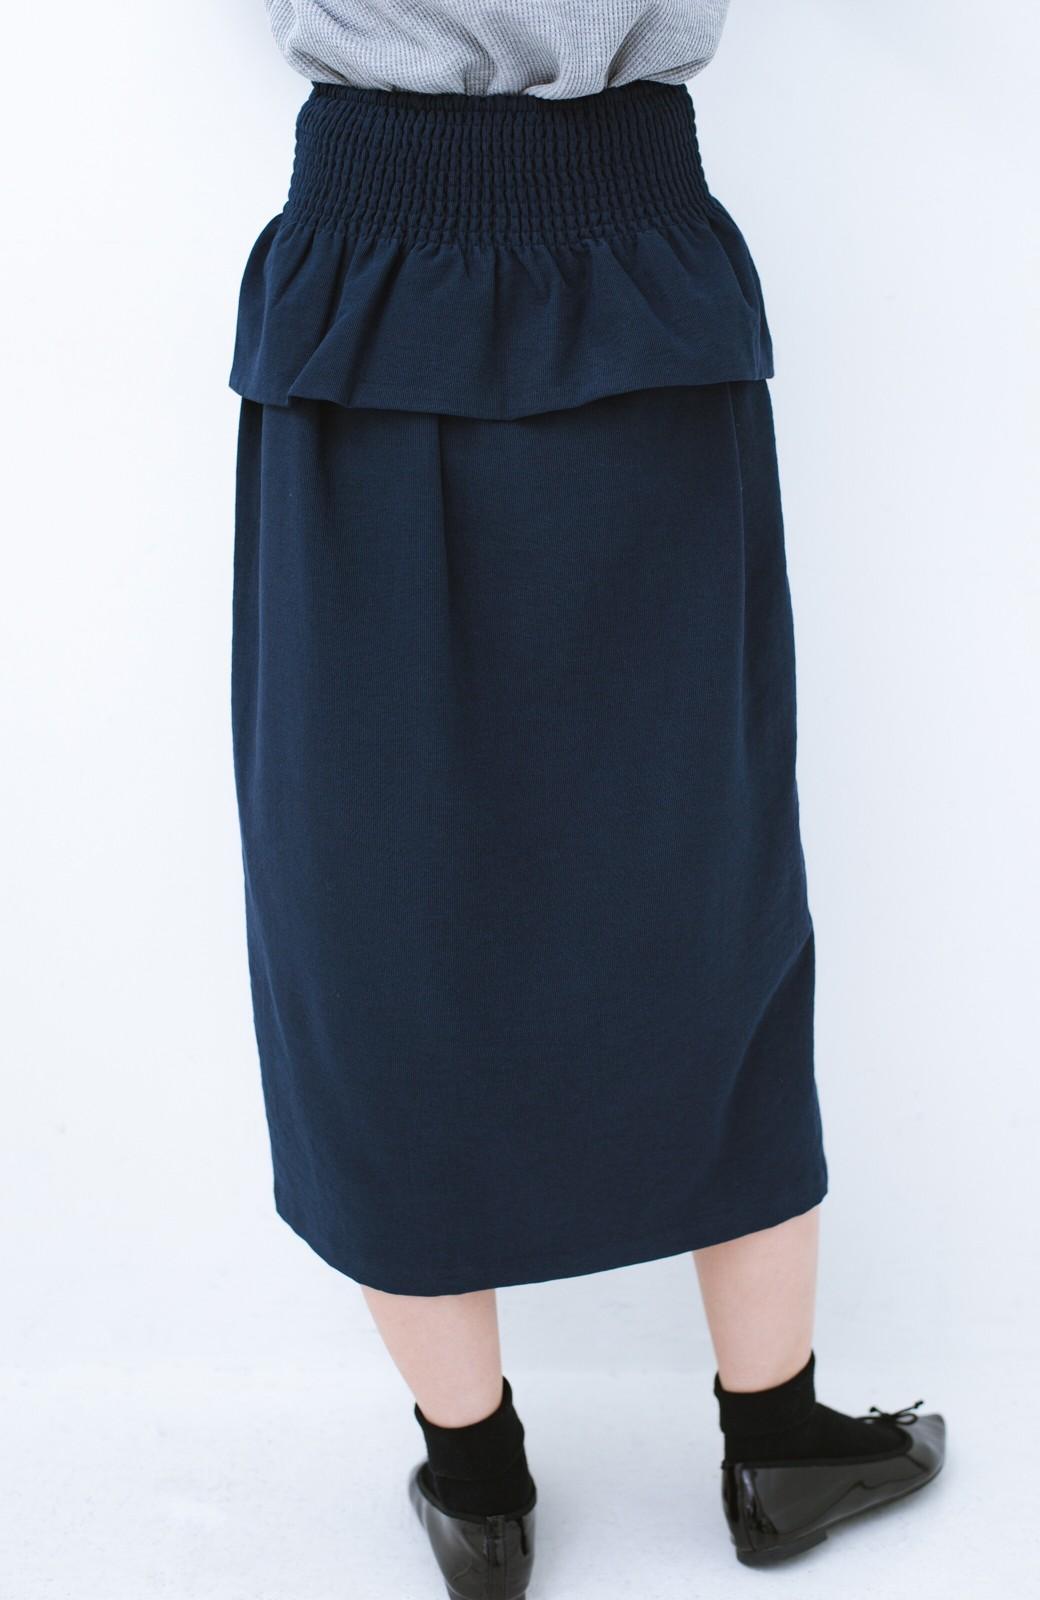 haco!  腹巻きとは呼ばせない ブルー期も華やかに過ごせる消臭加工裏地付きフリルデザインスカートセット【ブルー期】女の子バンザイ!プロジェクト <ネイビー>の商品写真13